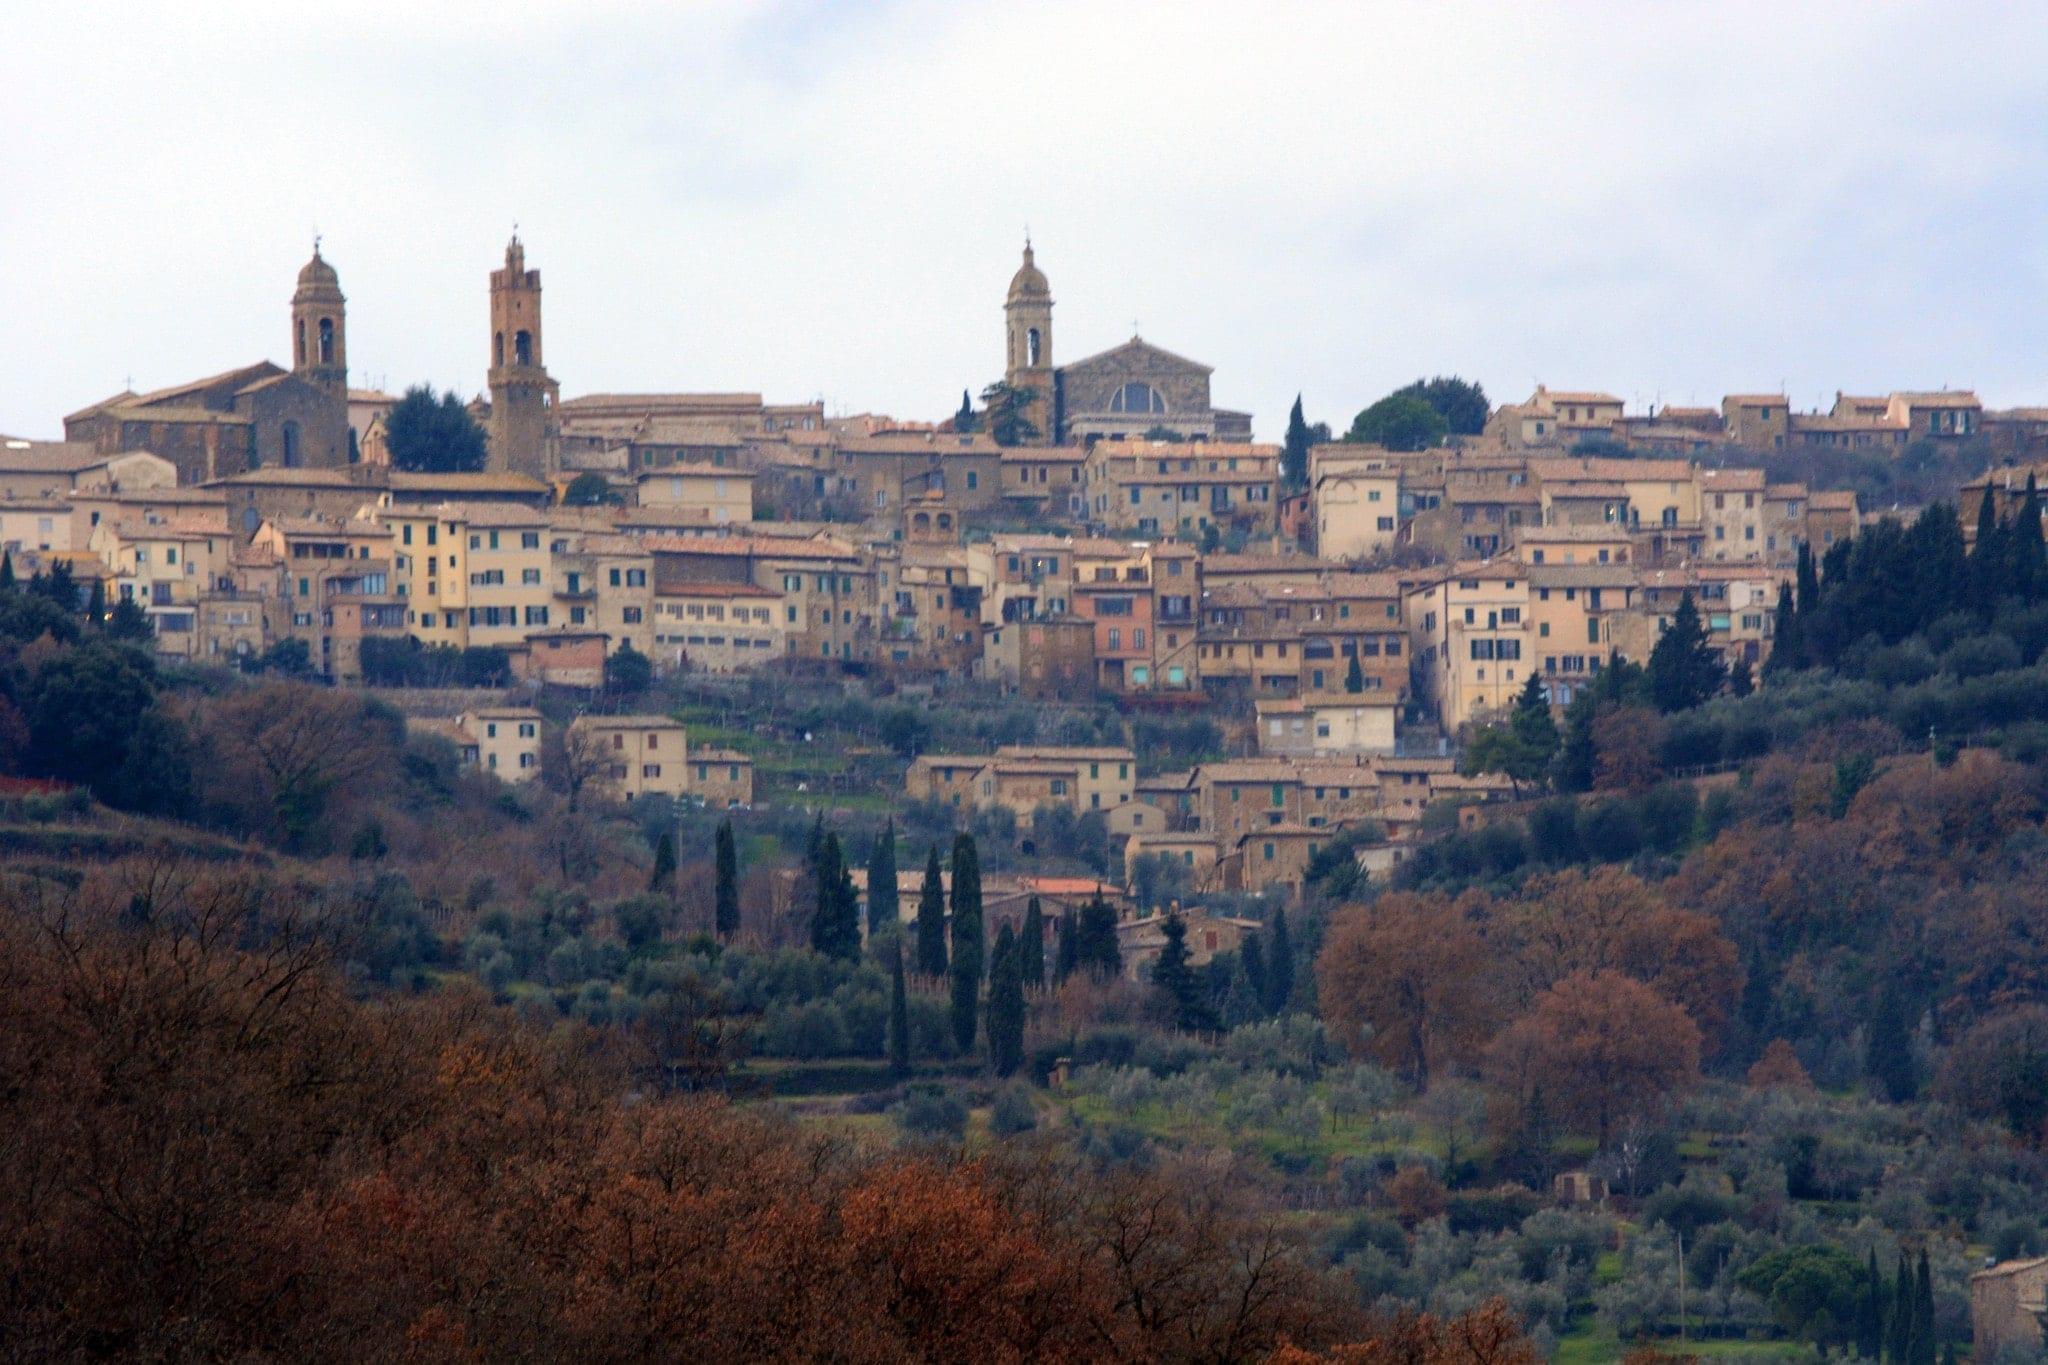 Montalcino village